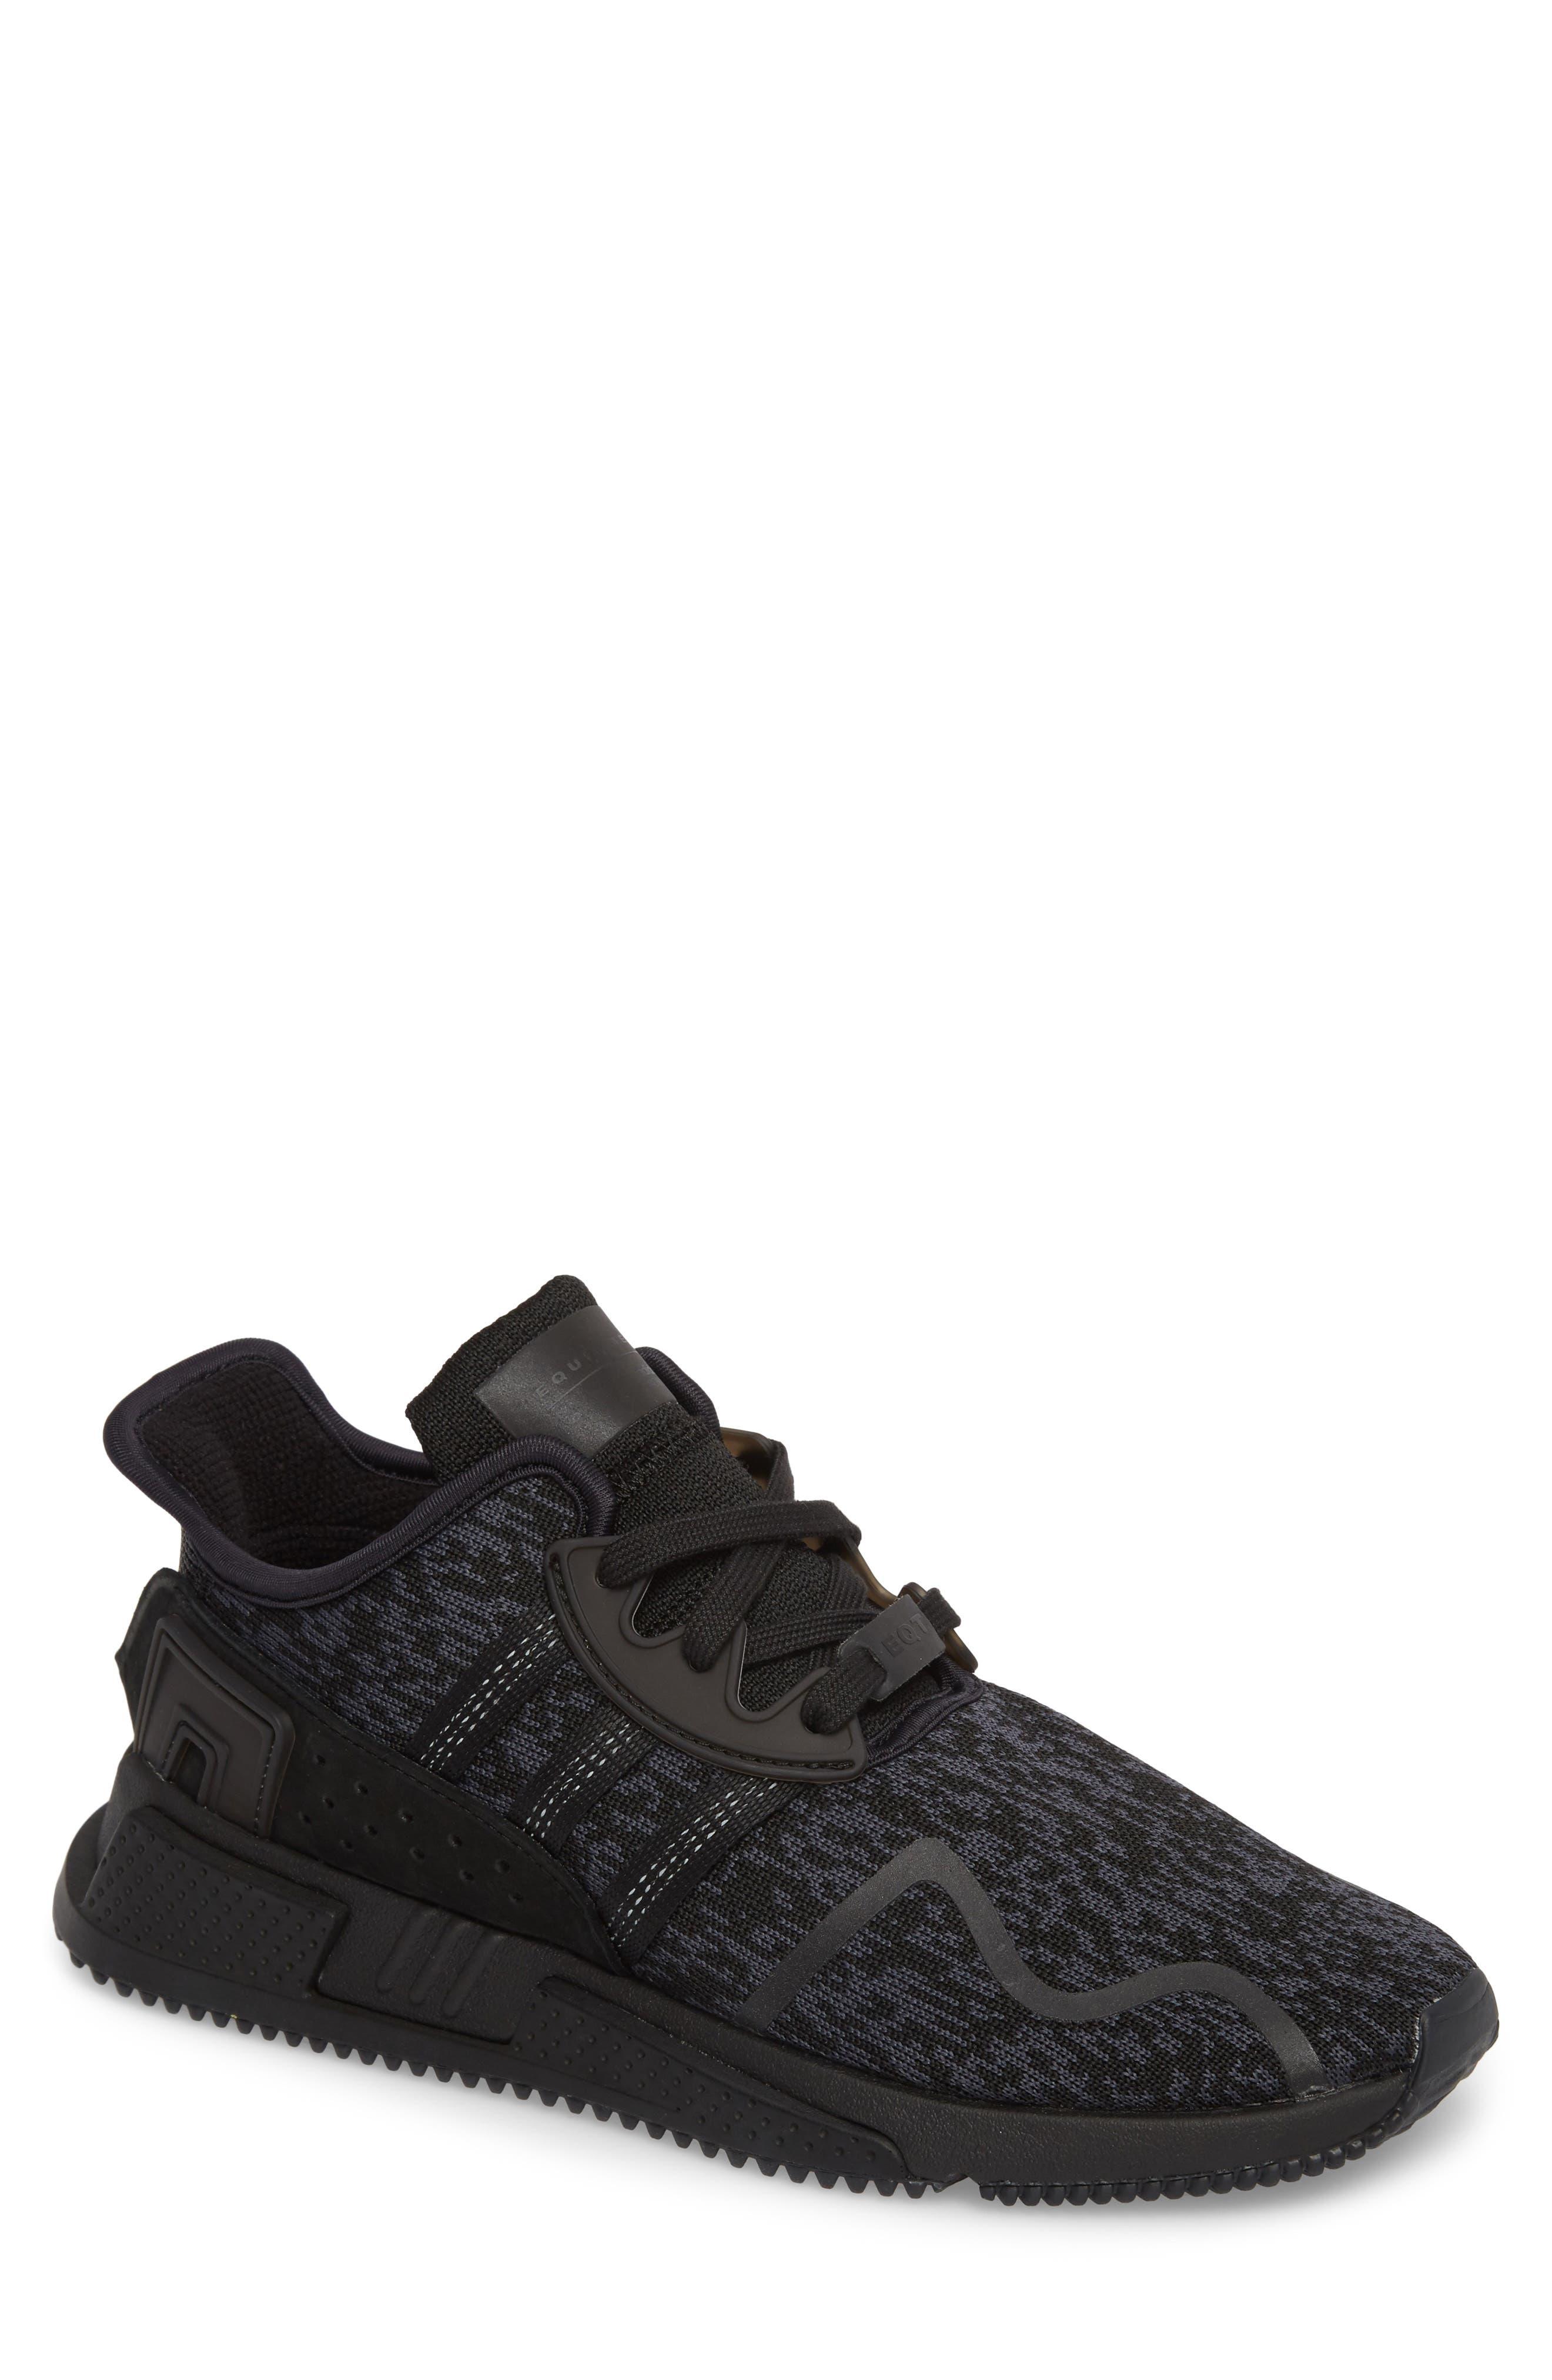 EQT Cushion ADV Sneaker,                         Main,                         color, Core Black/ Core Black